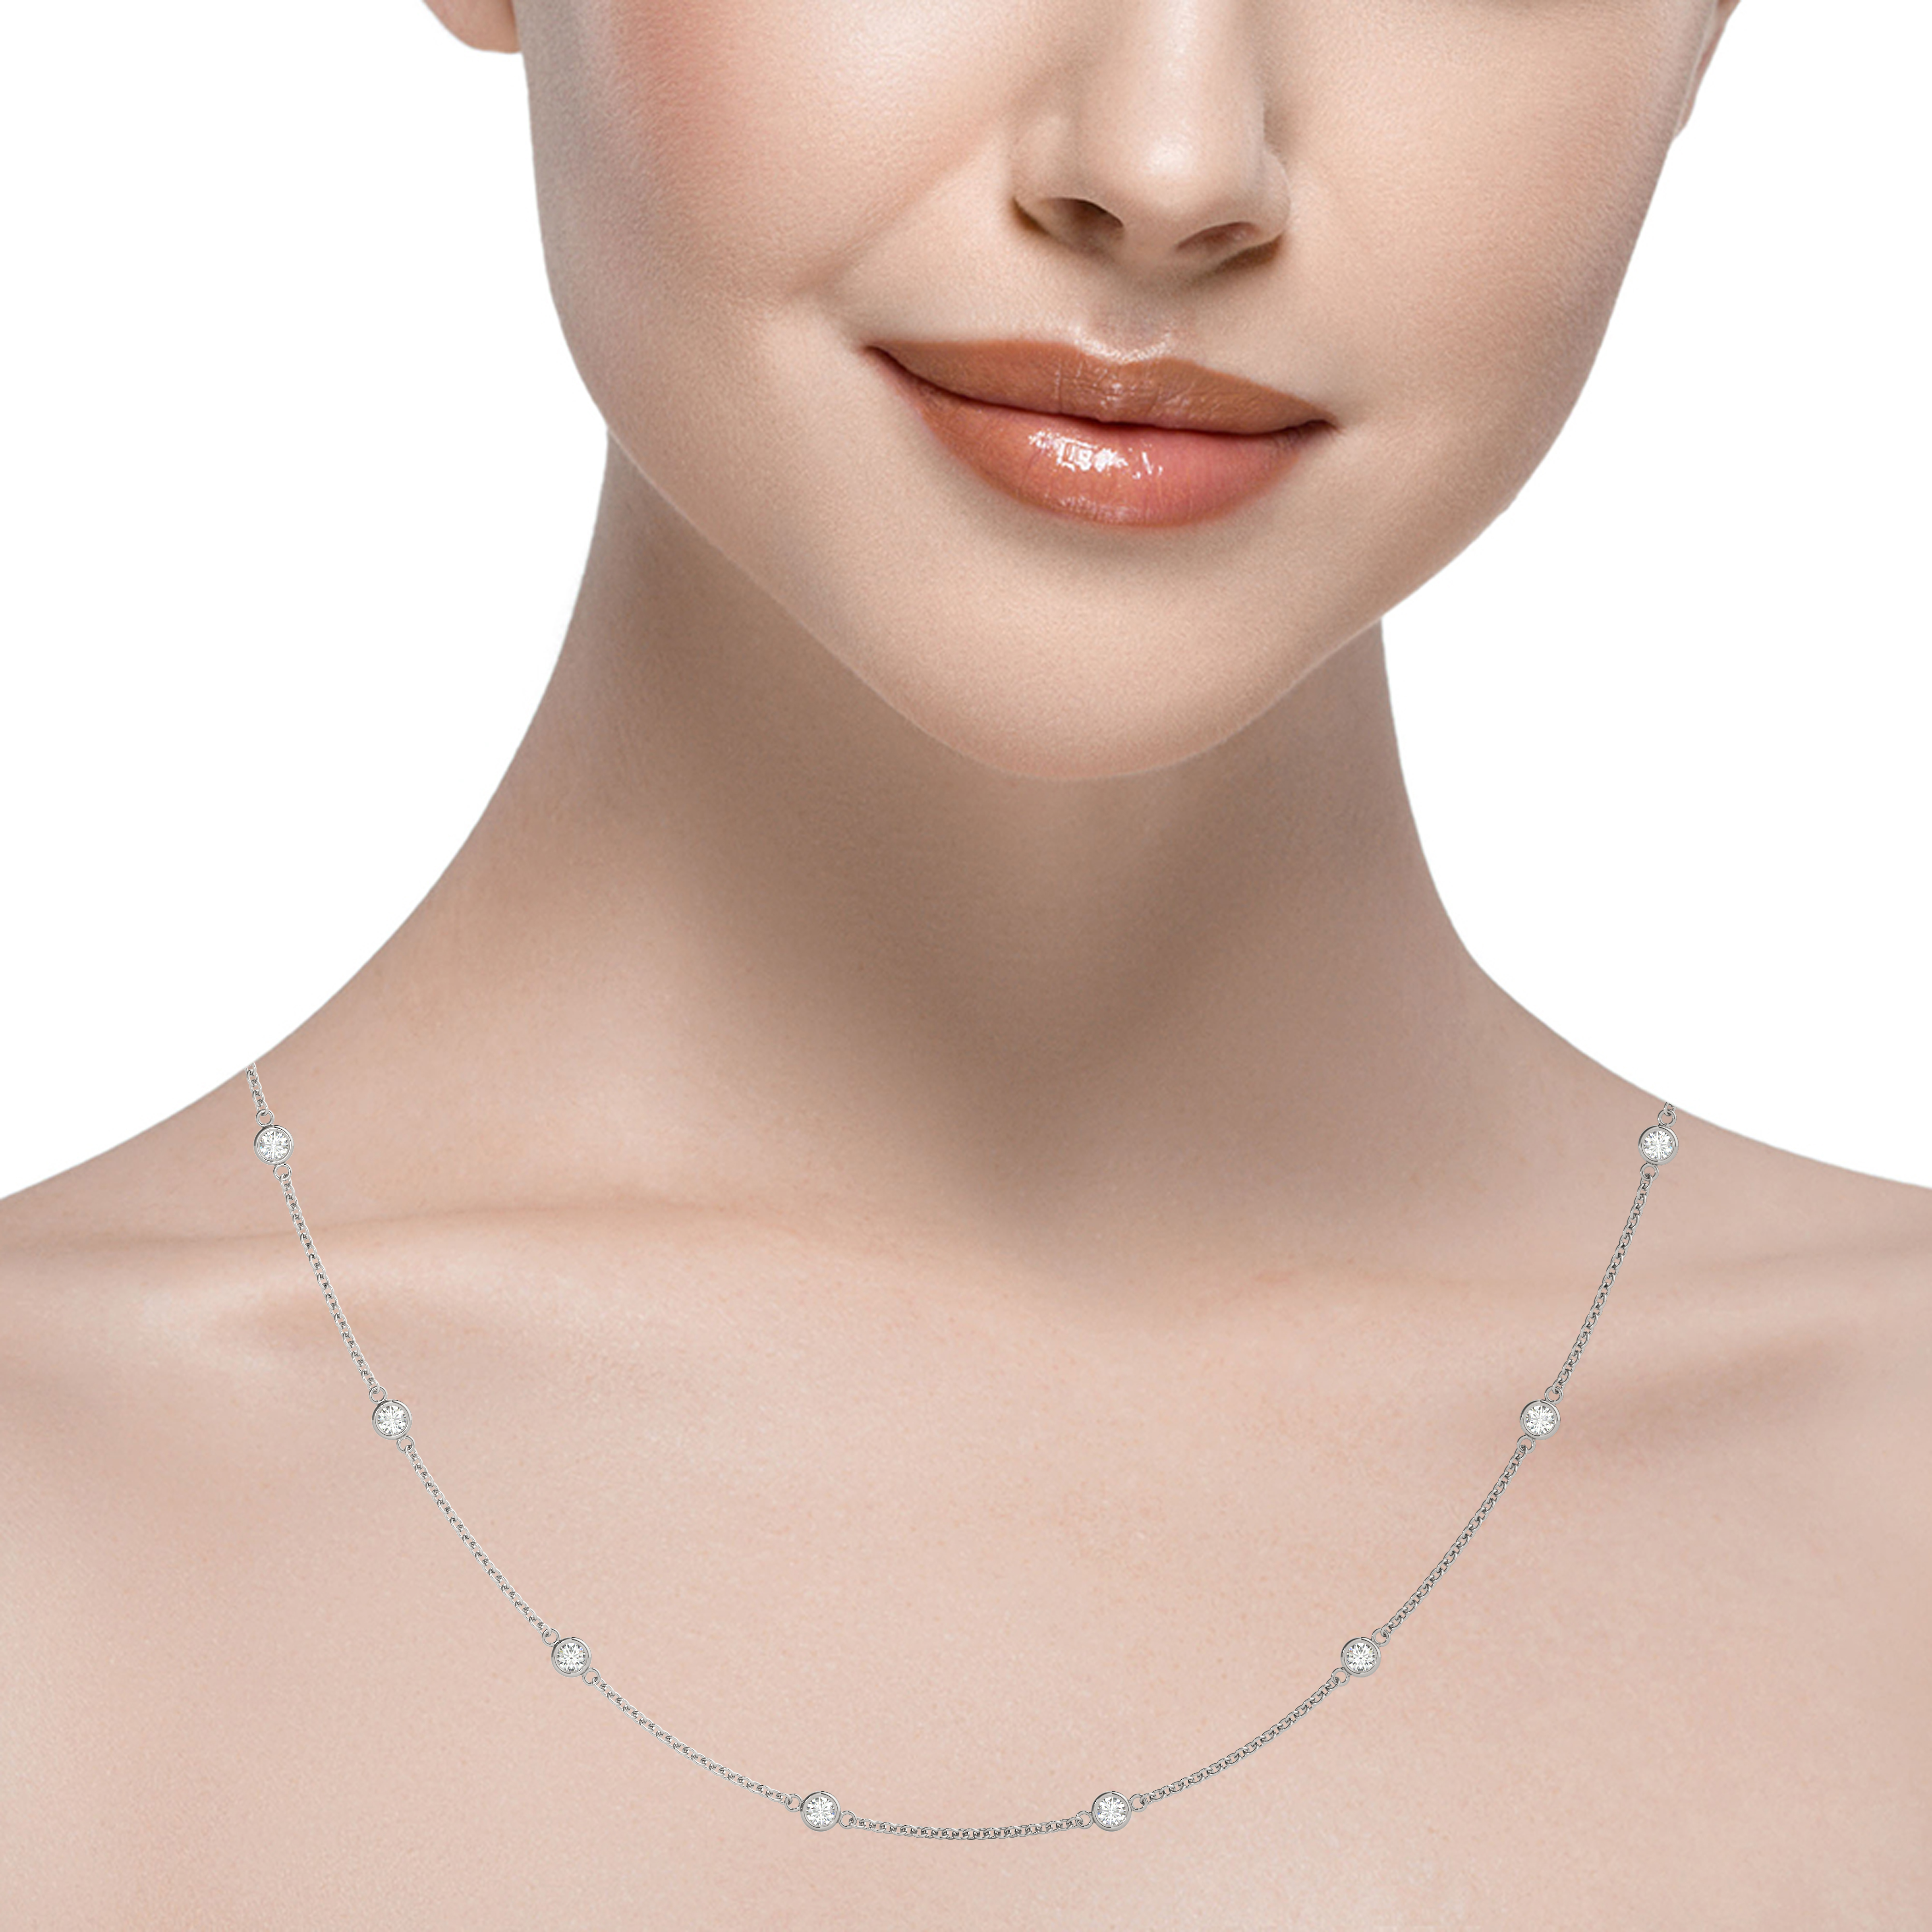 18k-white-gold-chain-diamond-necklace-60026-1